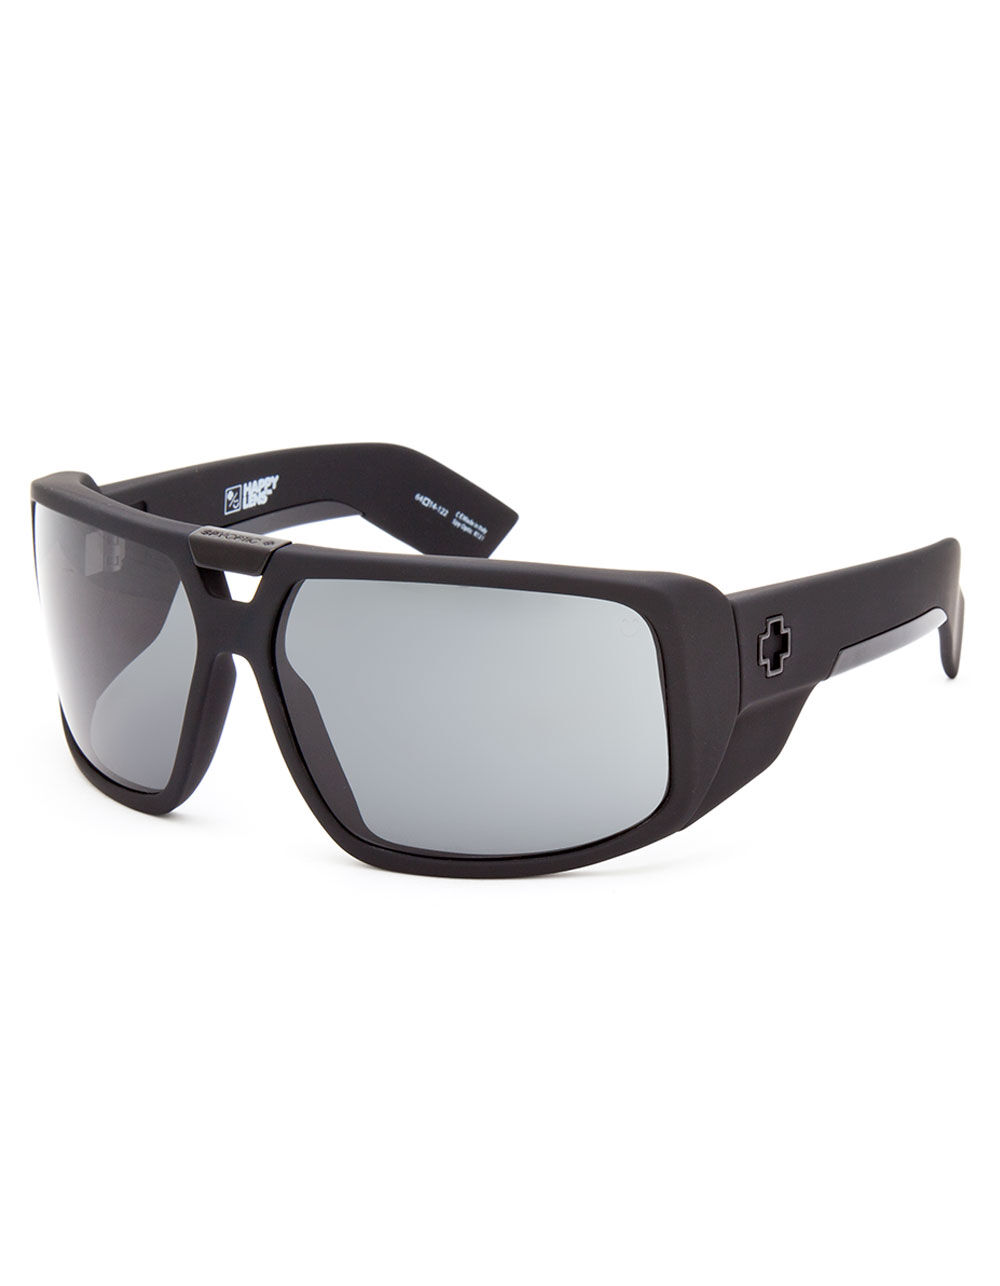 SPY Happy Lens Touring Sunglasses